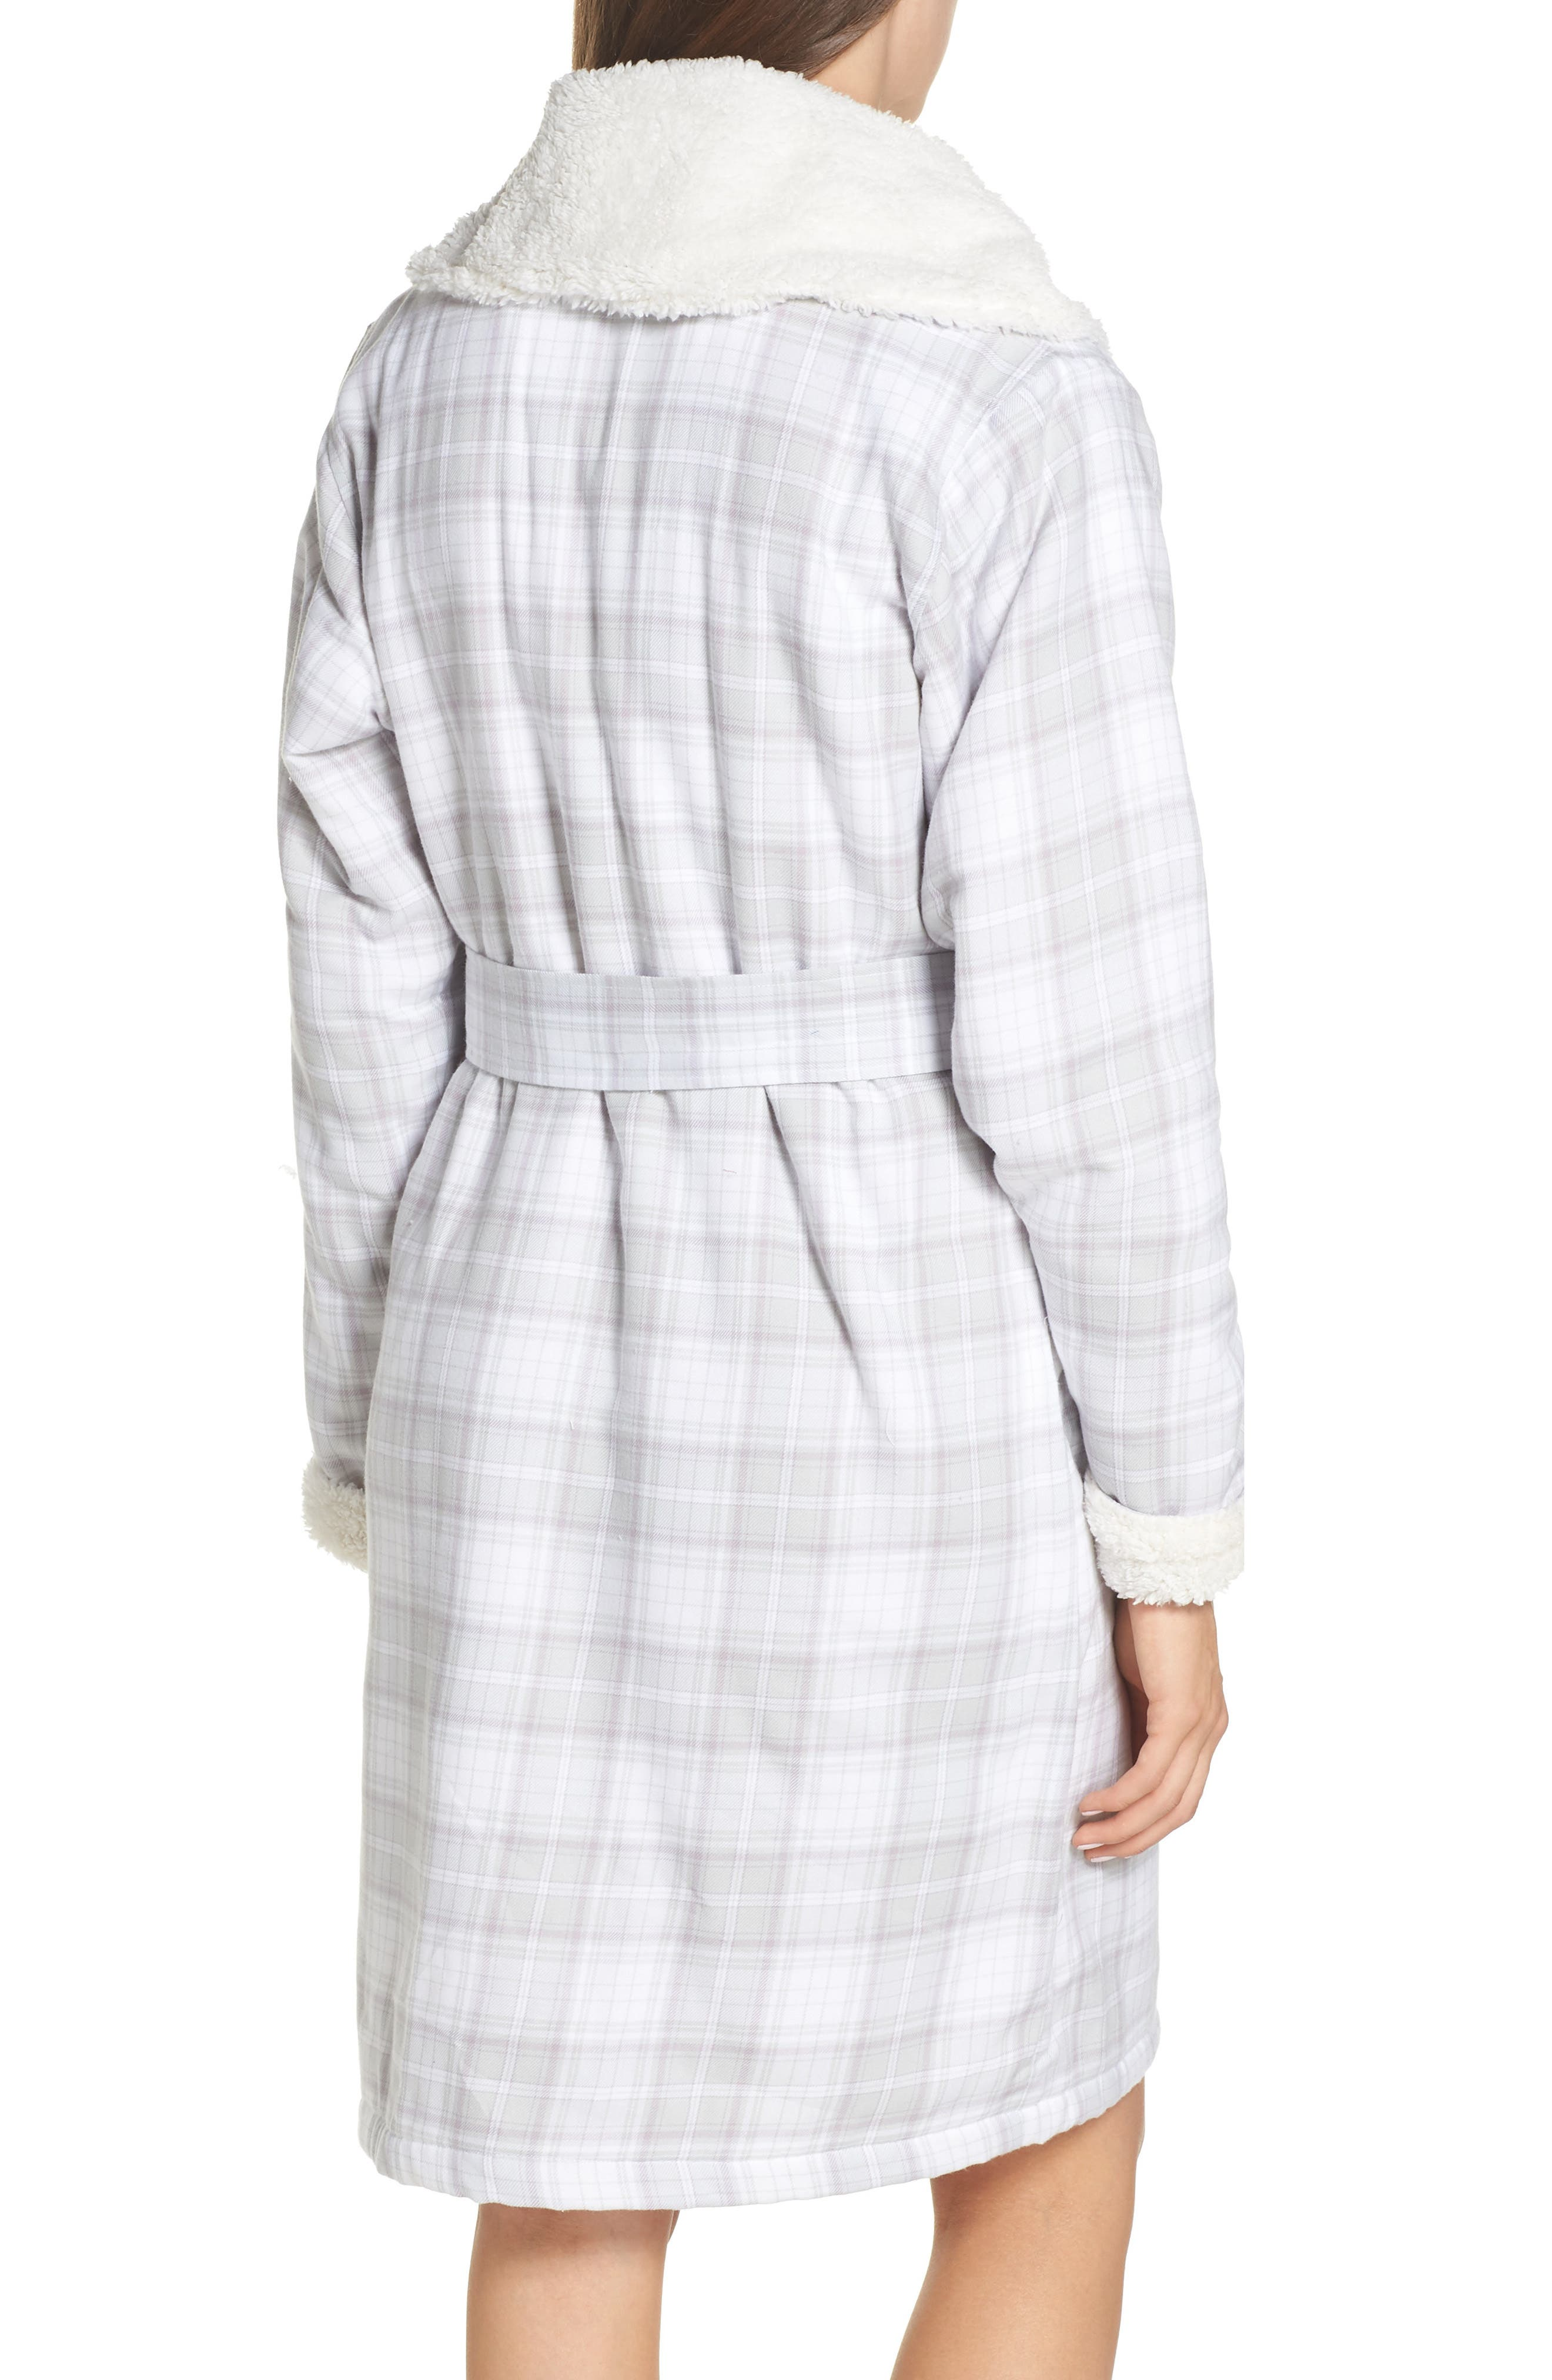 Anika Fleece Lined Flannel Robe,                             Alternate thumbnail 2, color,                             LAVENDER AURA PLAID